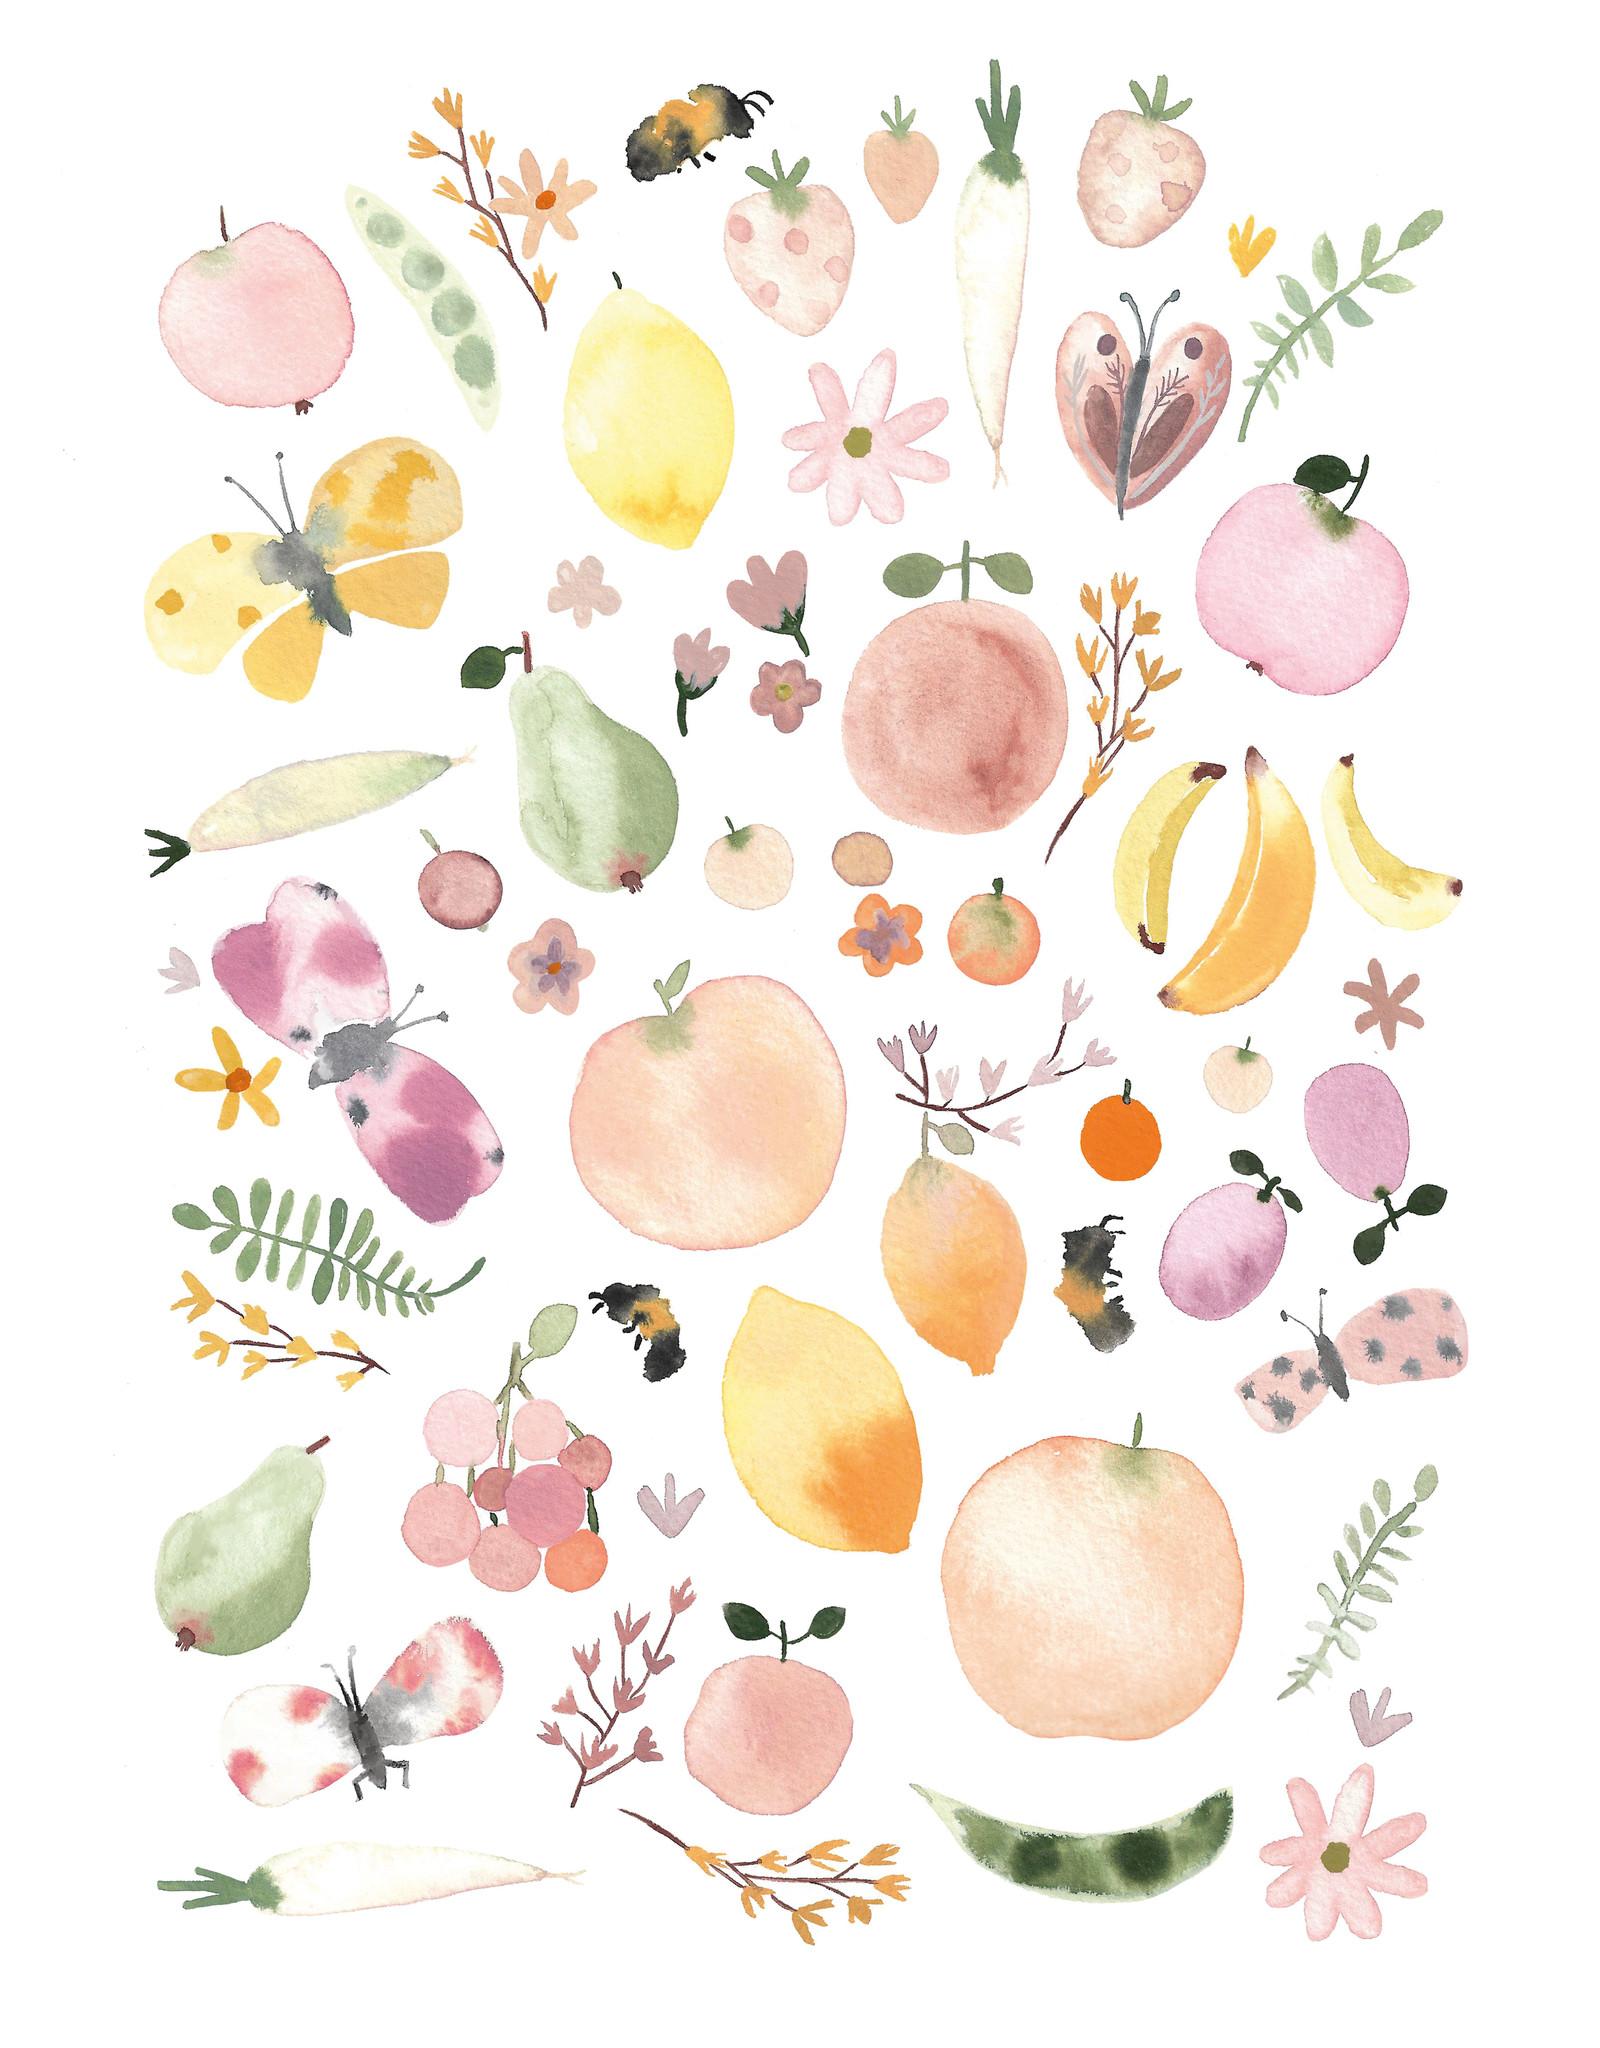 Print Summermarket watercolor illustration